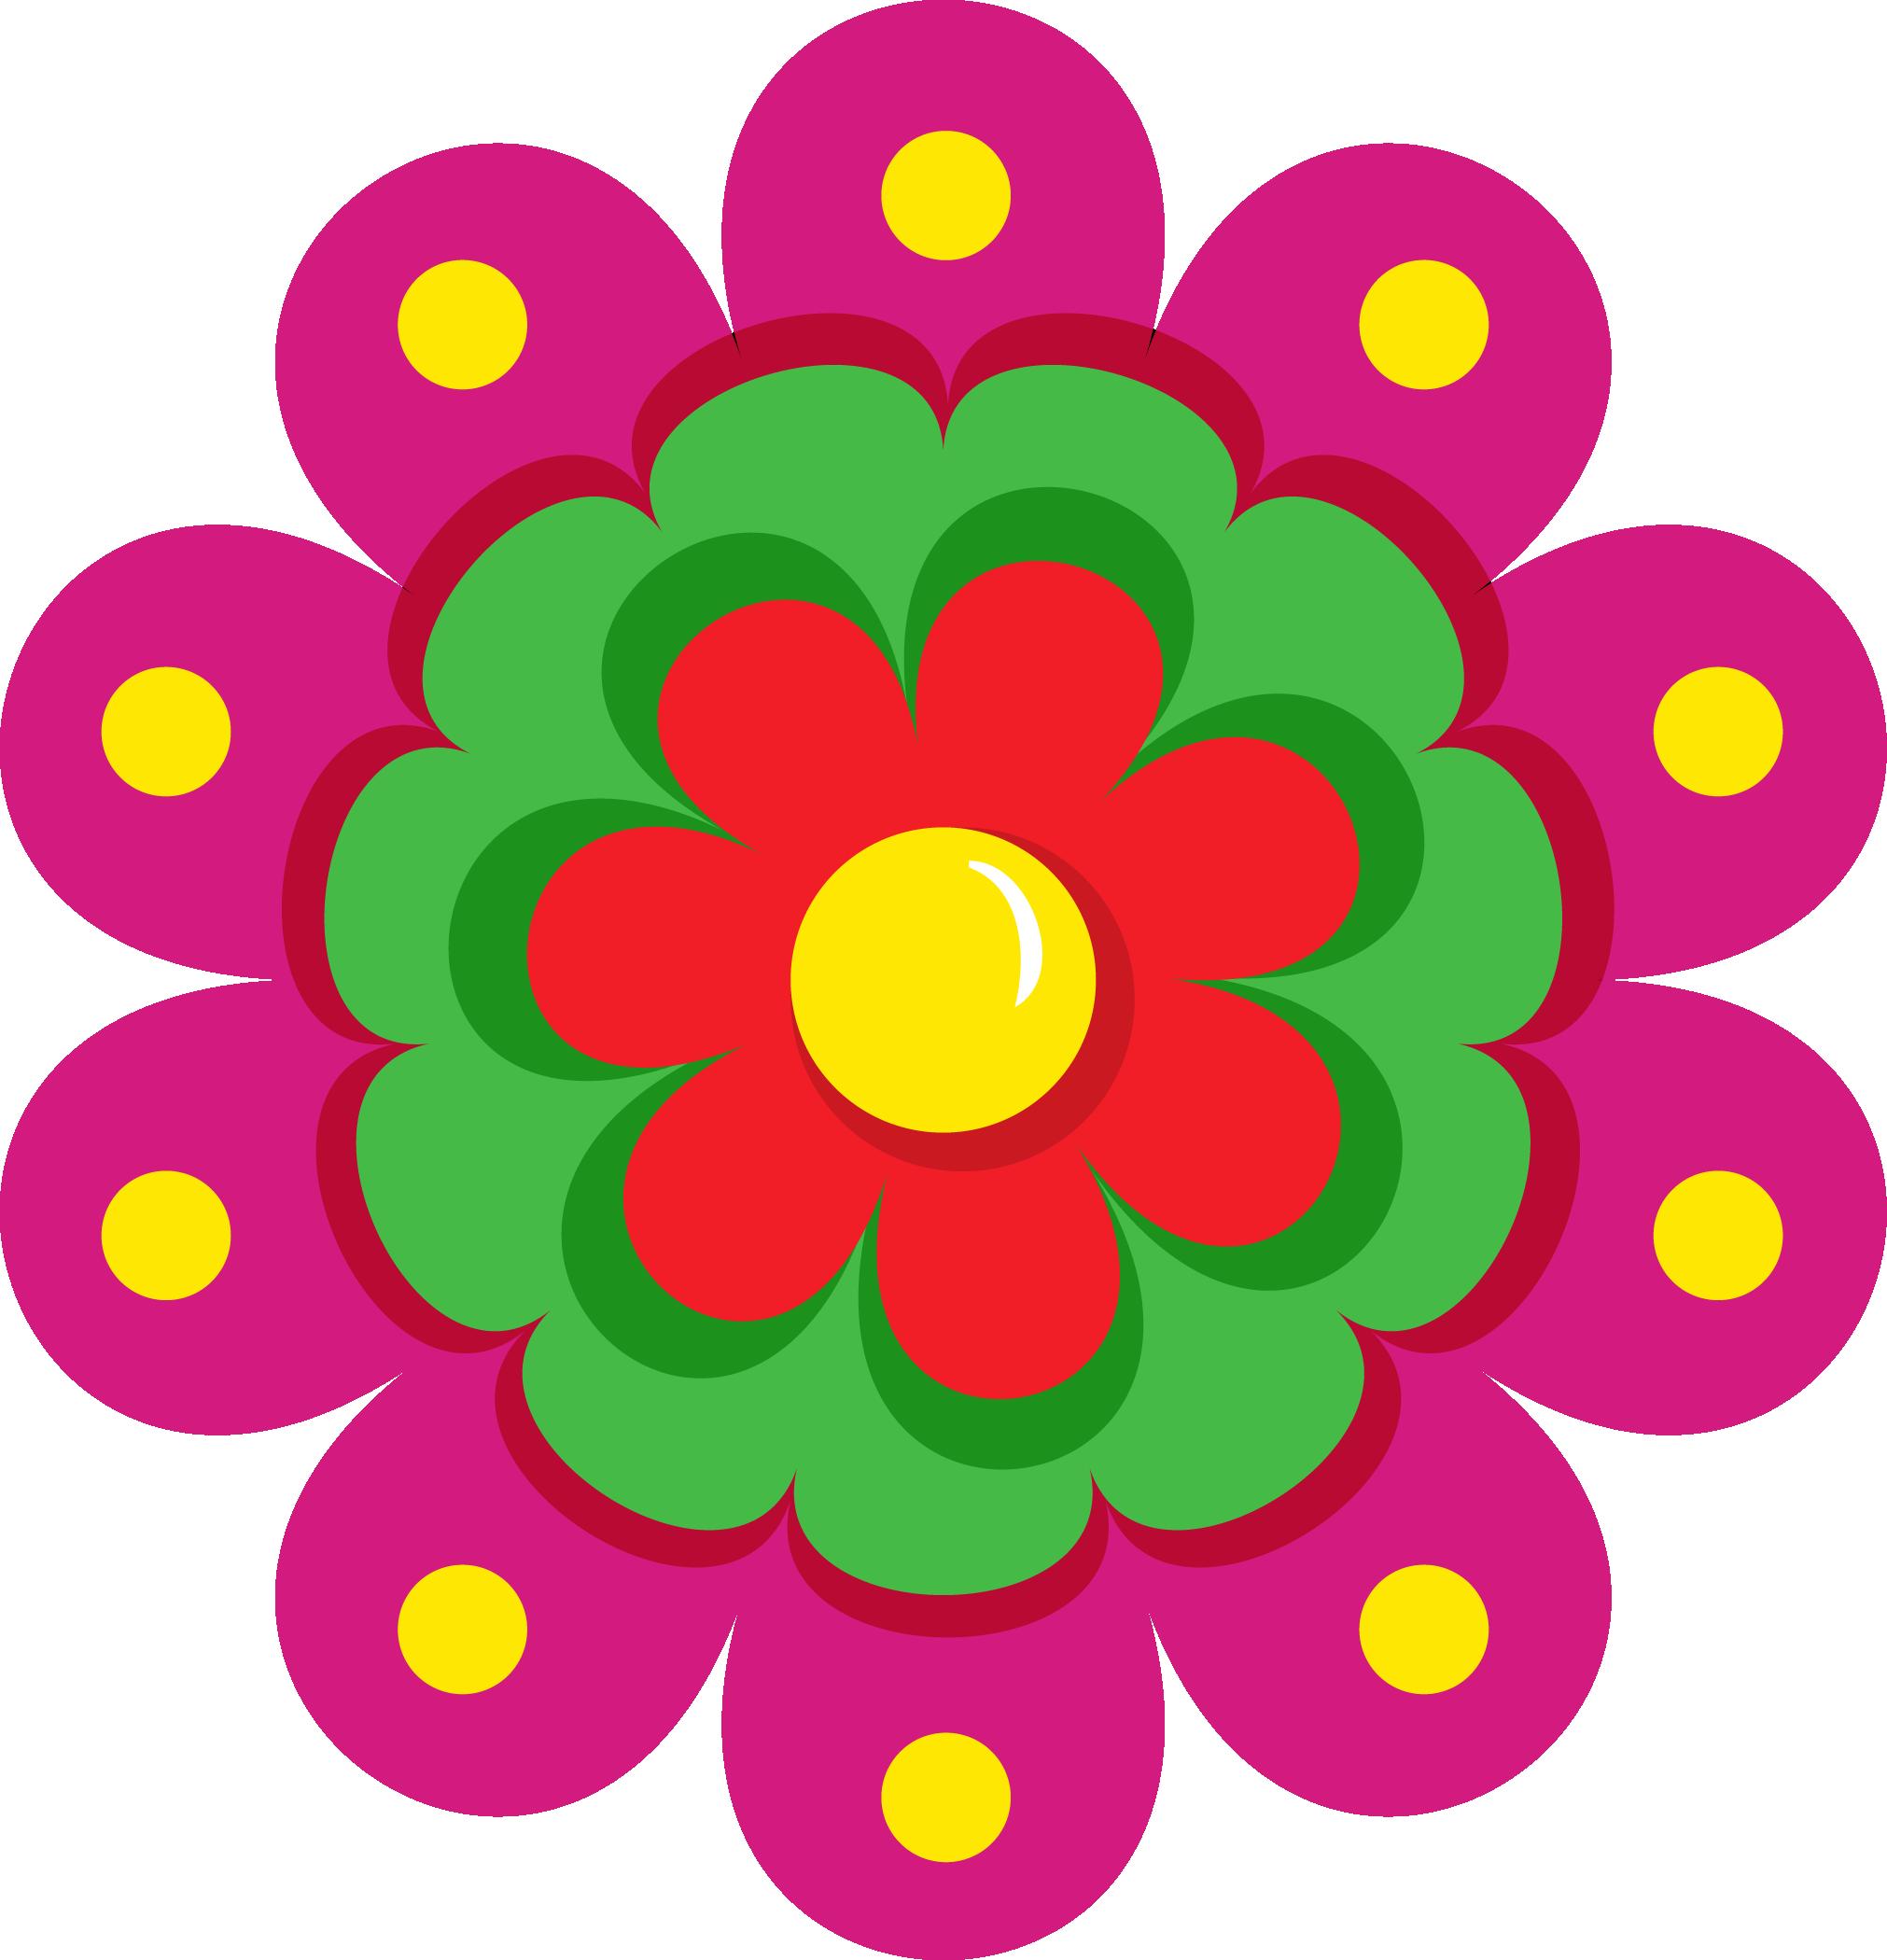 Schaffer grant diplawmatic dialogues. Pinata clipart flower mexican